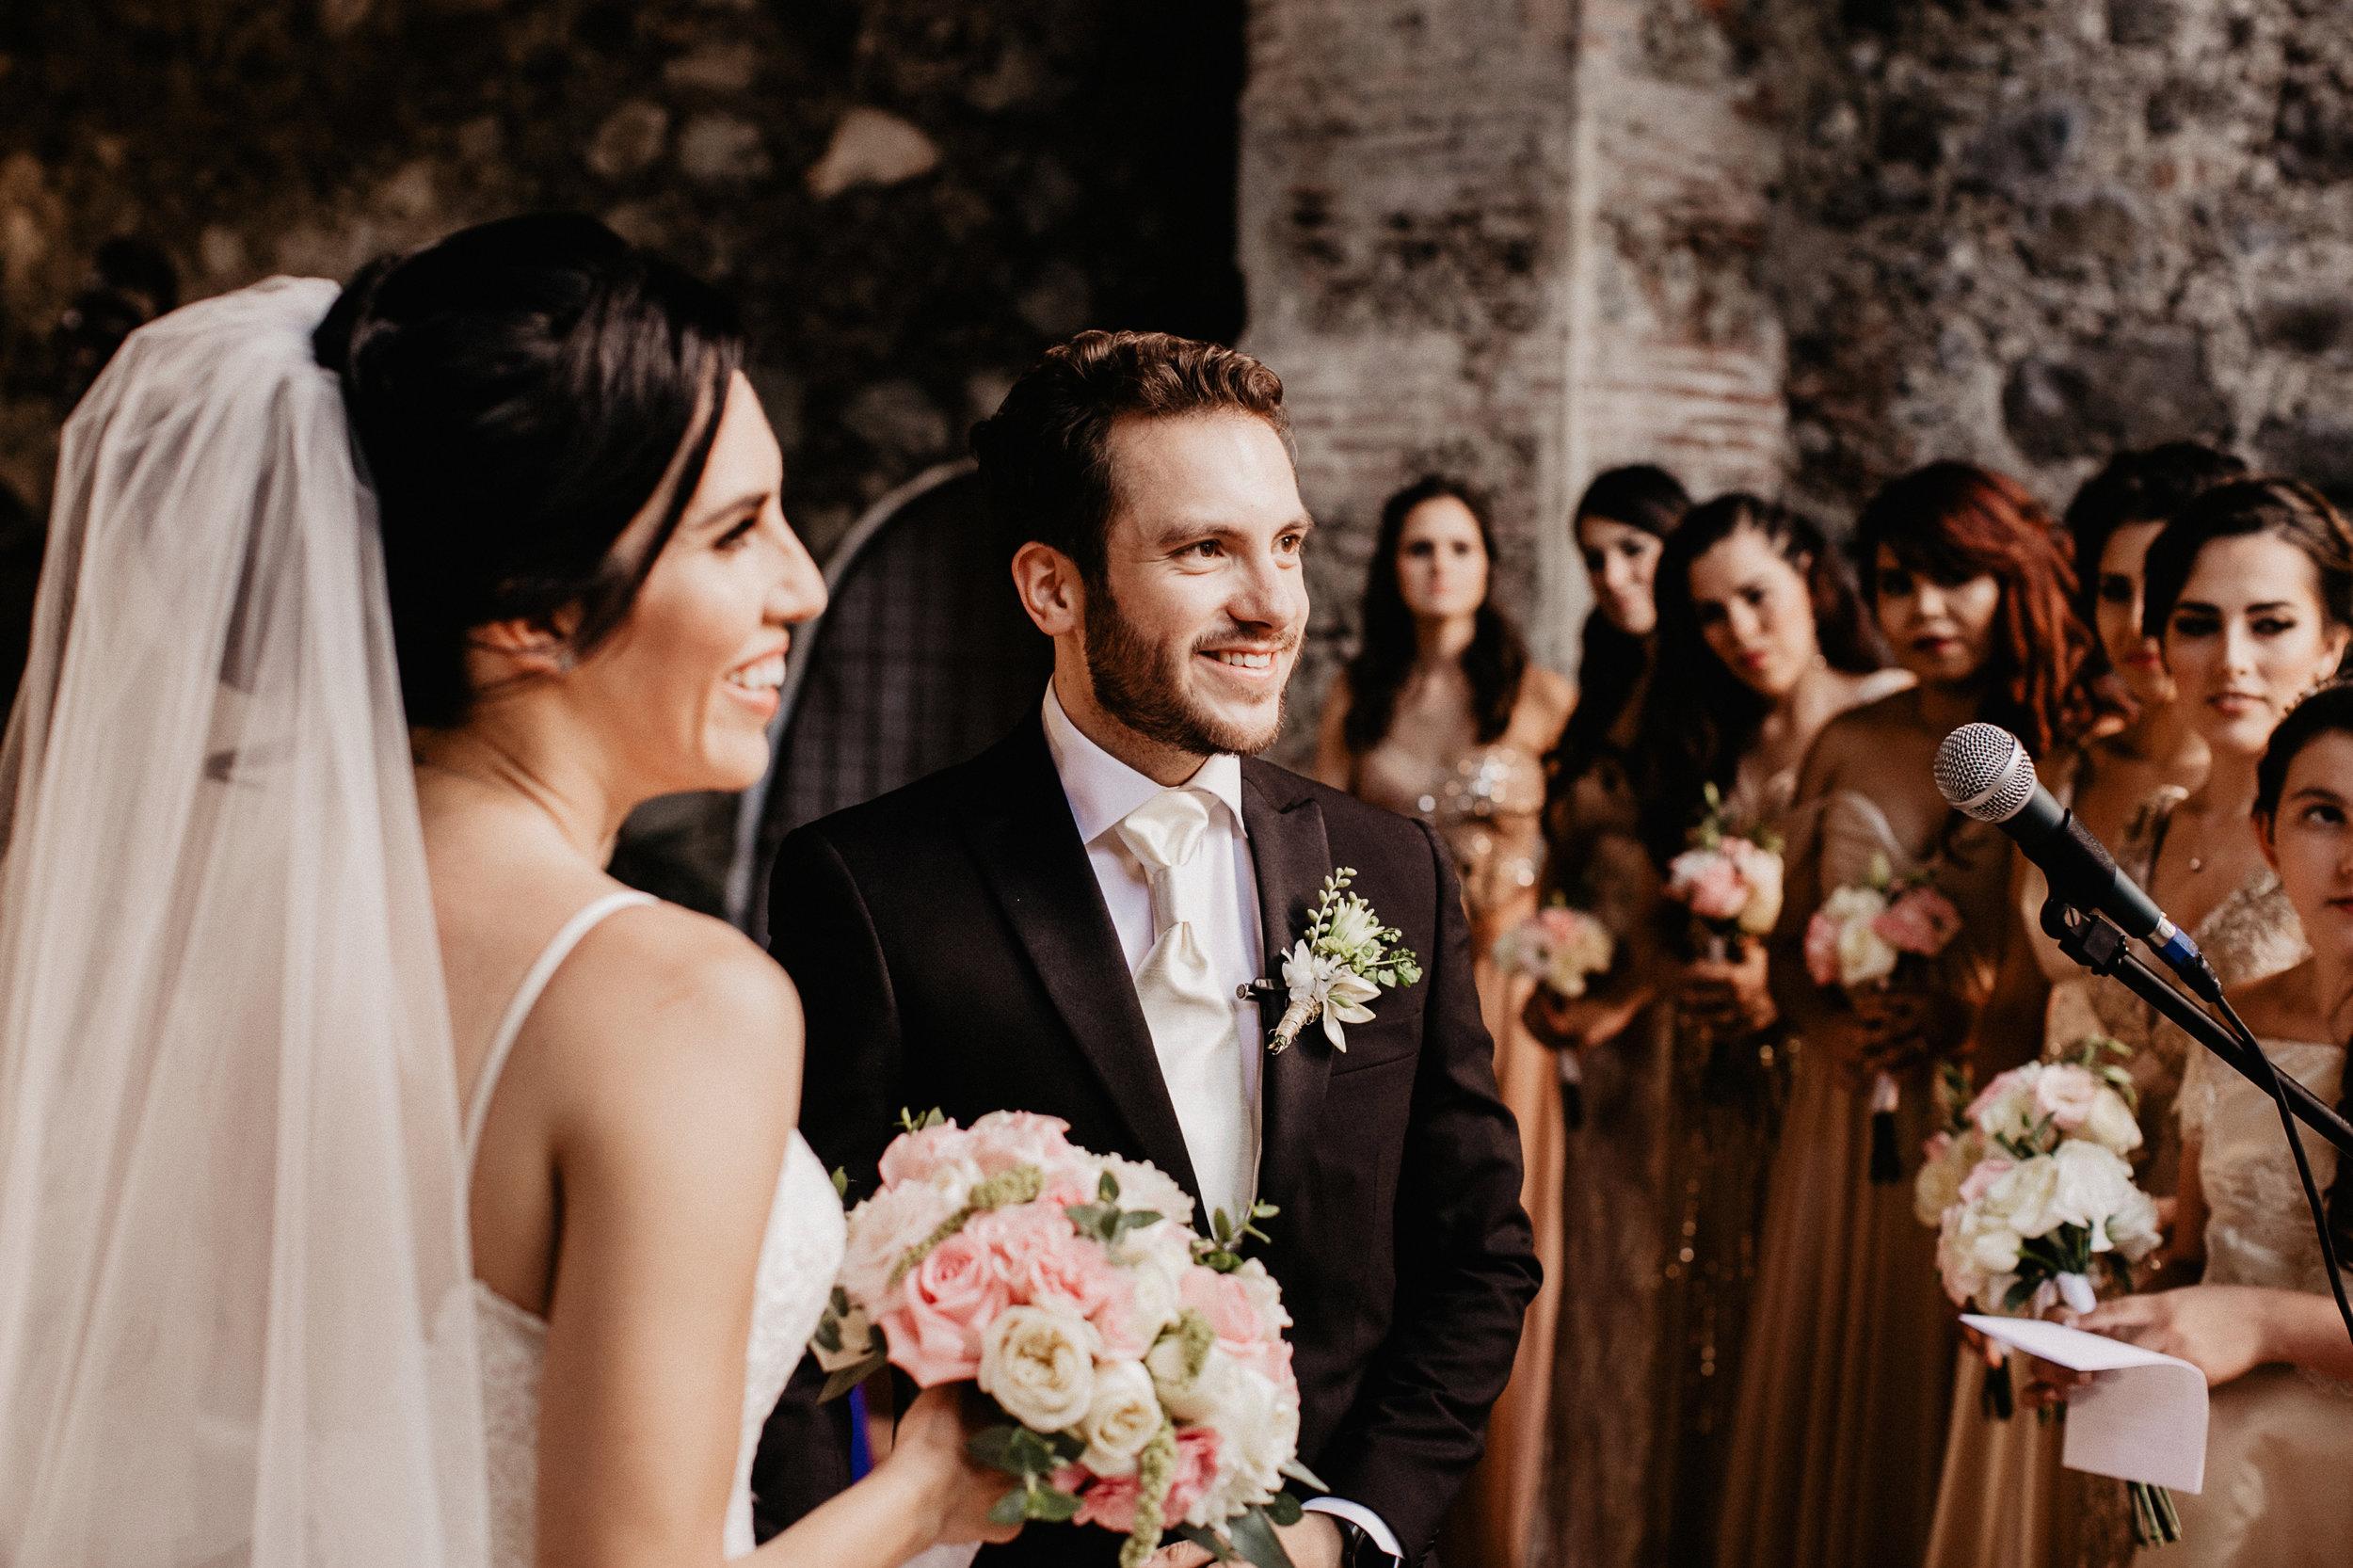 Alfonso_flores_destination_wedding_photography_vanesa_carlos-464.JPG